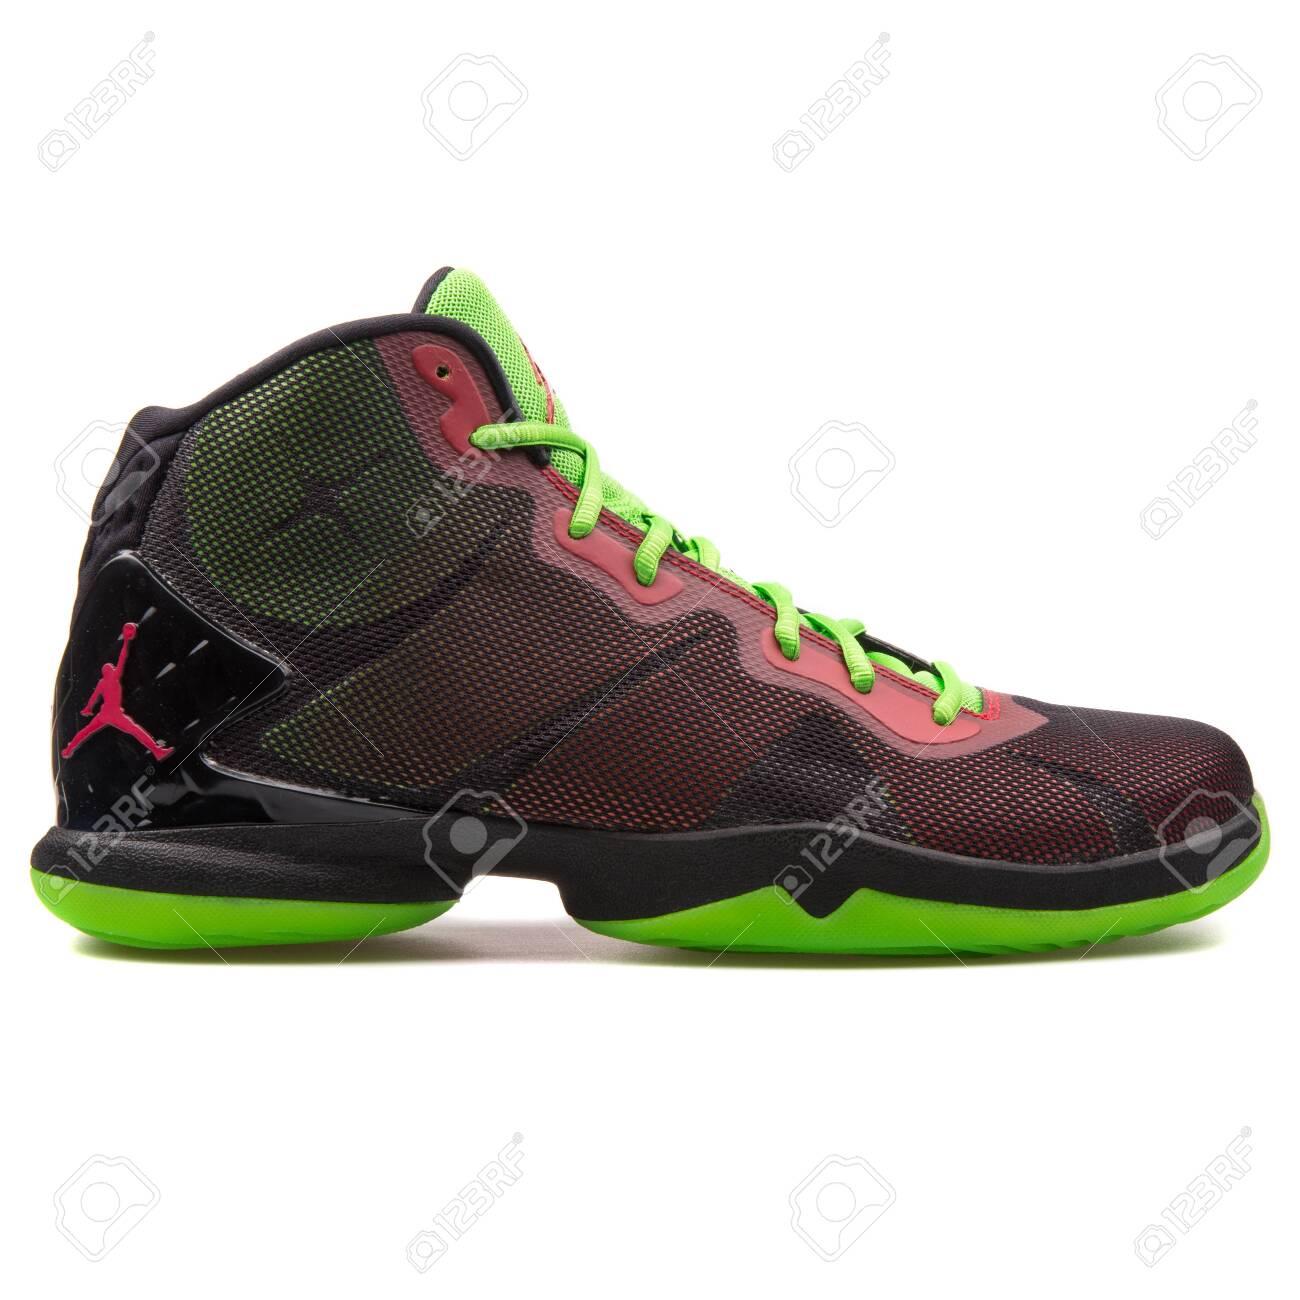 Nike Jordan Super Fly 4 Black,.. Stock